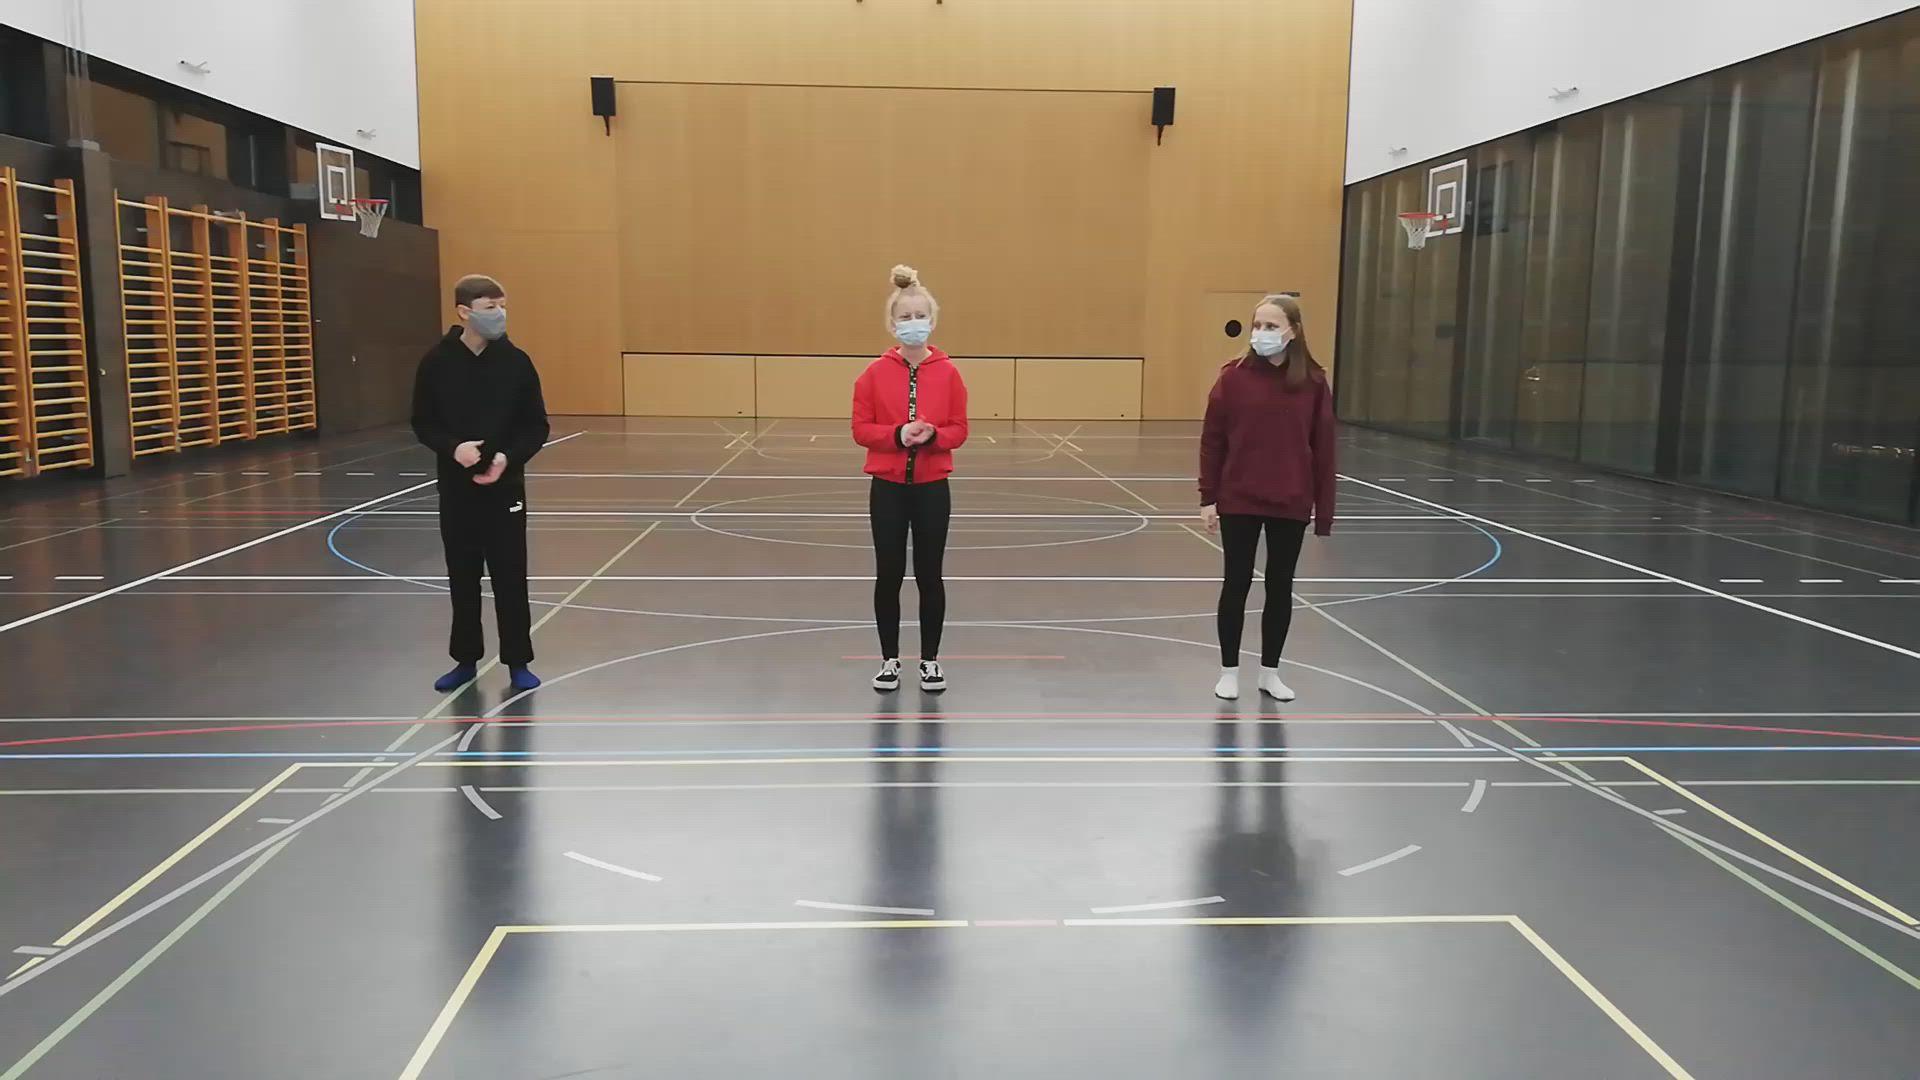 Tanzen an Weihnachten 2020